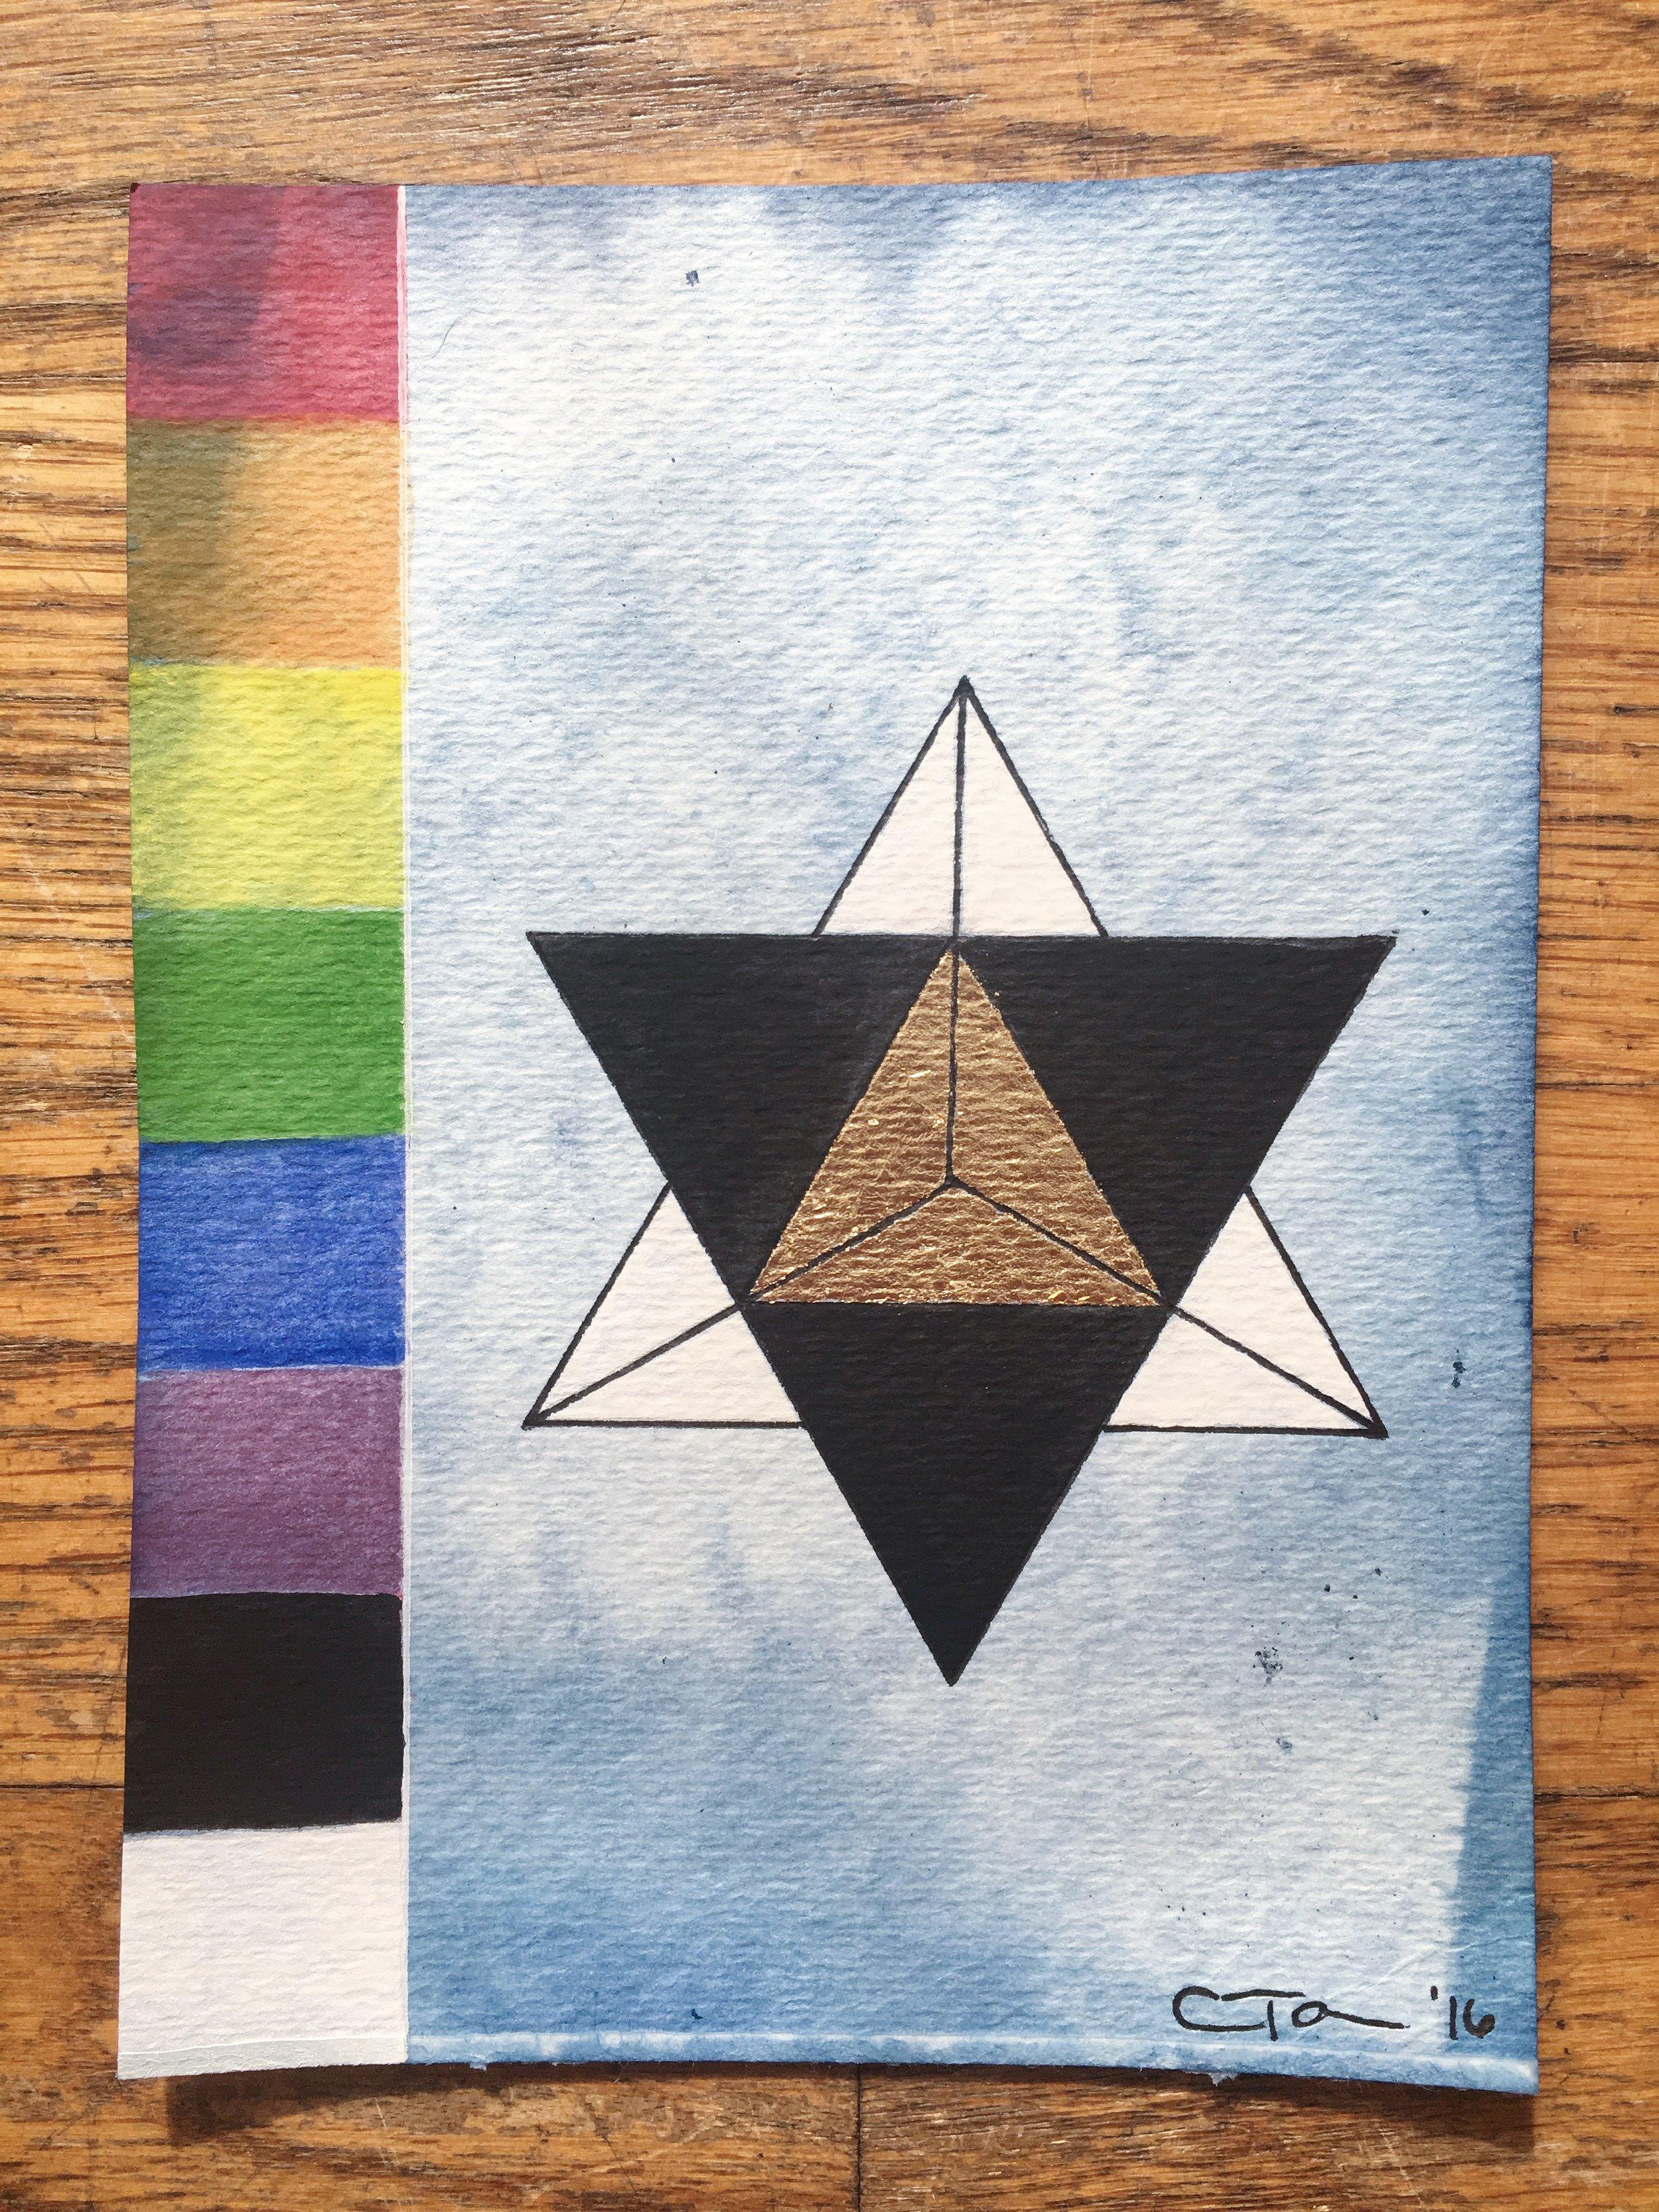 Rainbow Geometry Variation of Star Tetrahedron